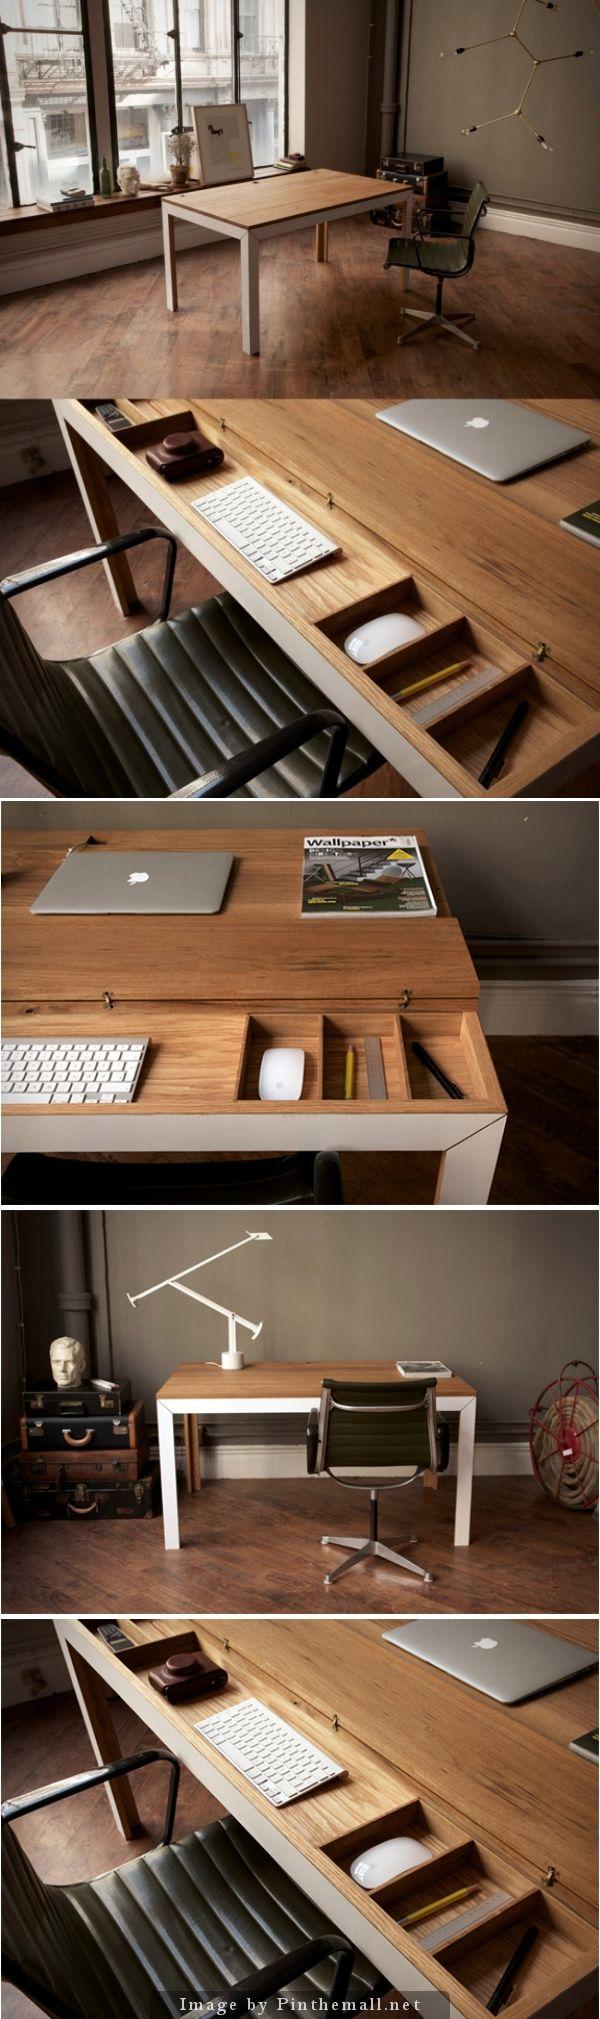 tribeca desk, by soren rose | ideas | pinterest | die besten ideen, Möbel